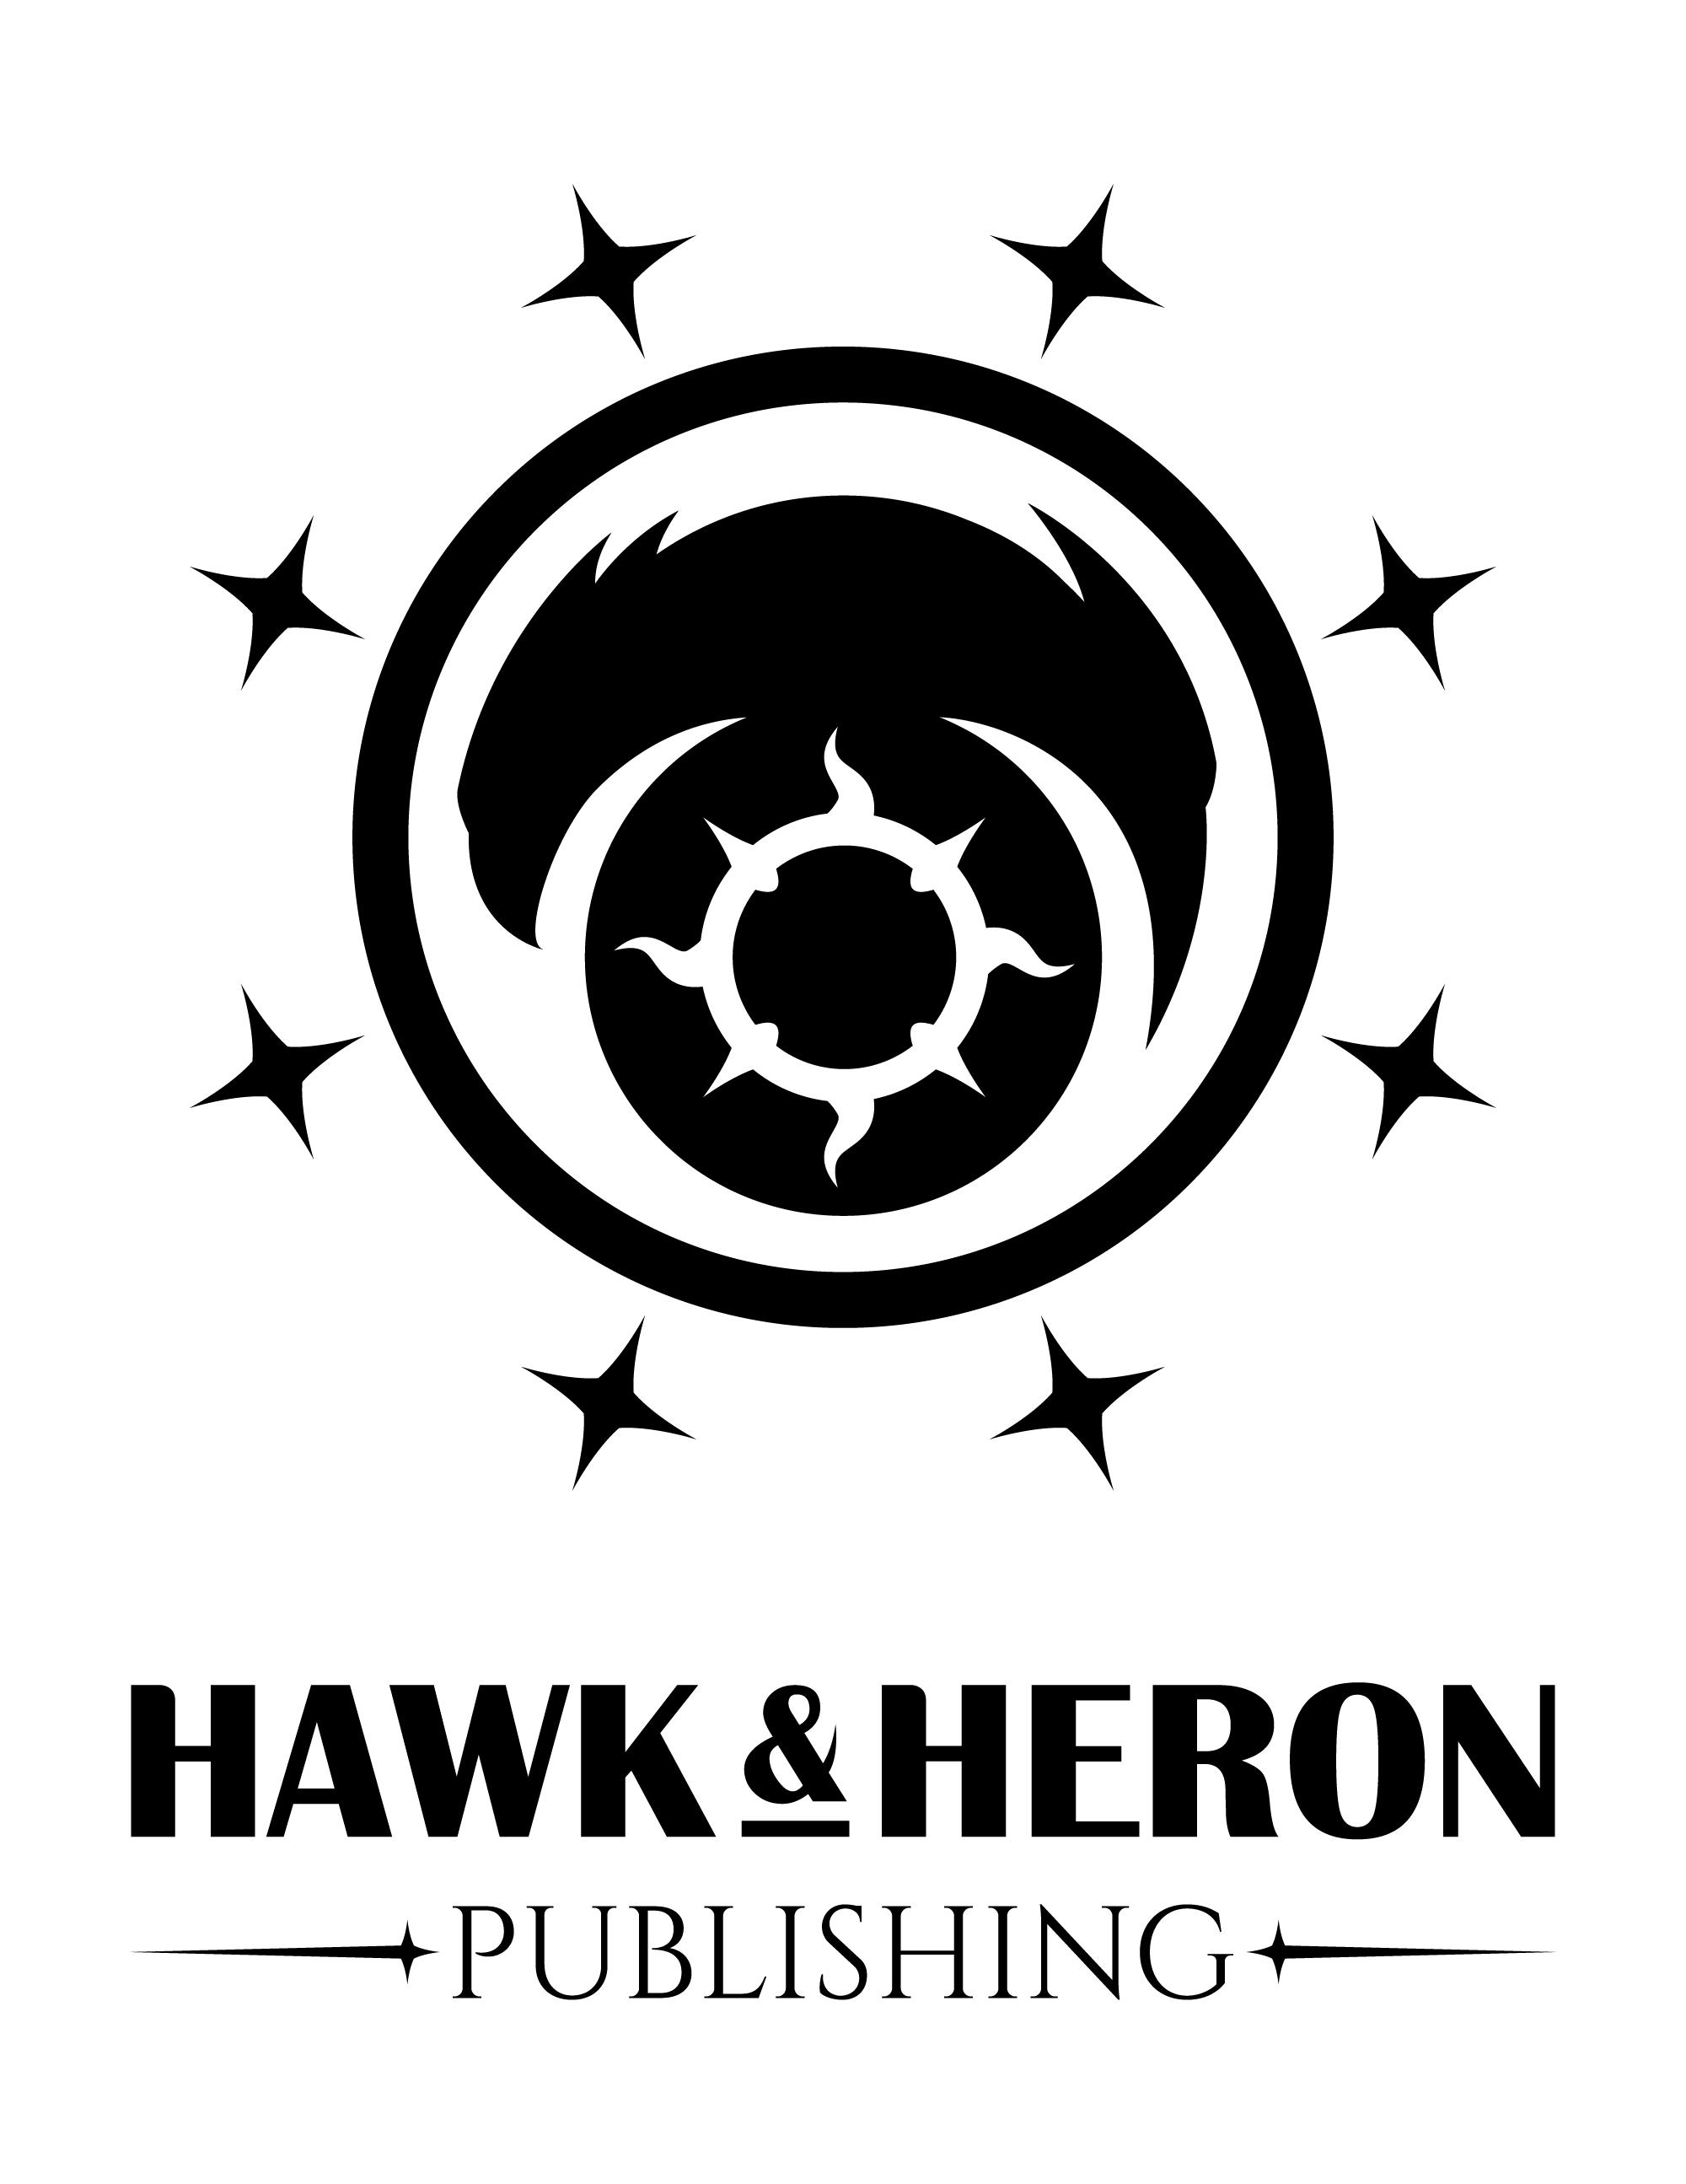 Tyler-Sehn_Hawk-Heron-Publishing_Full-Light-Final